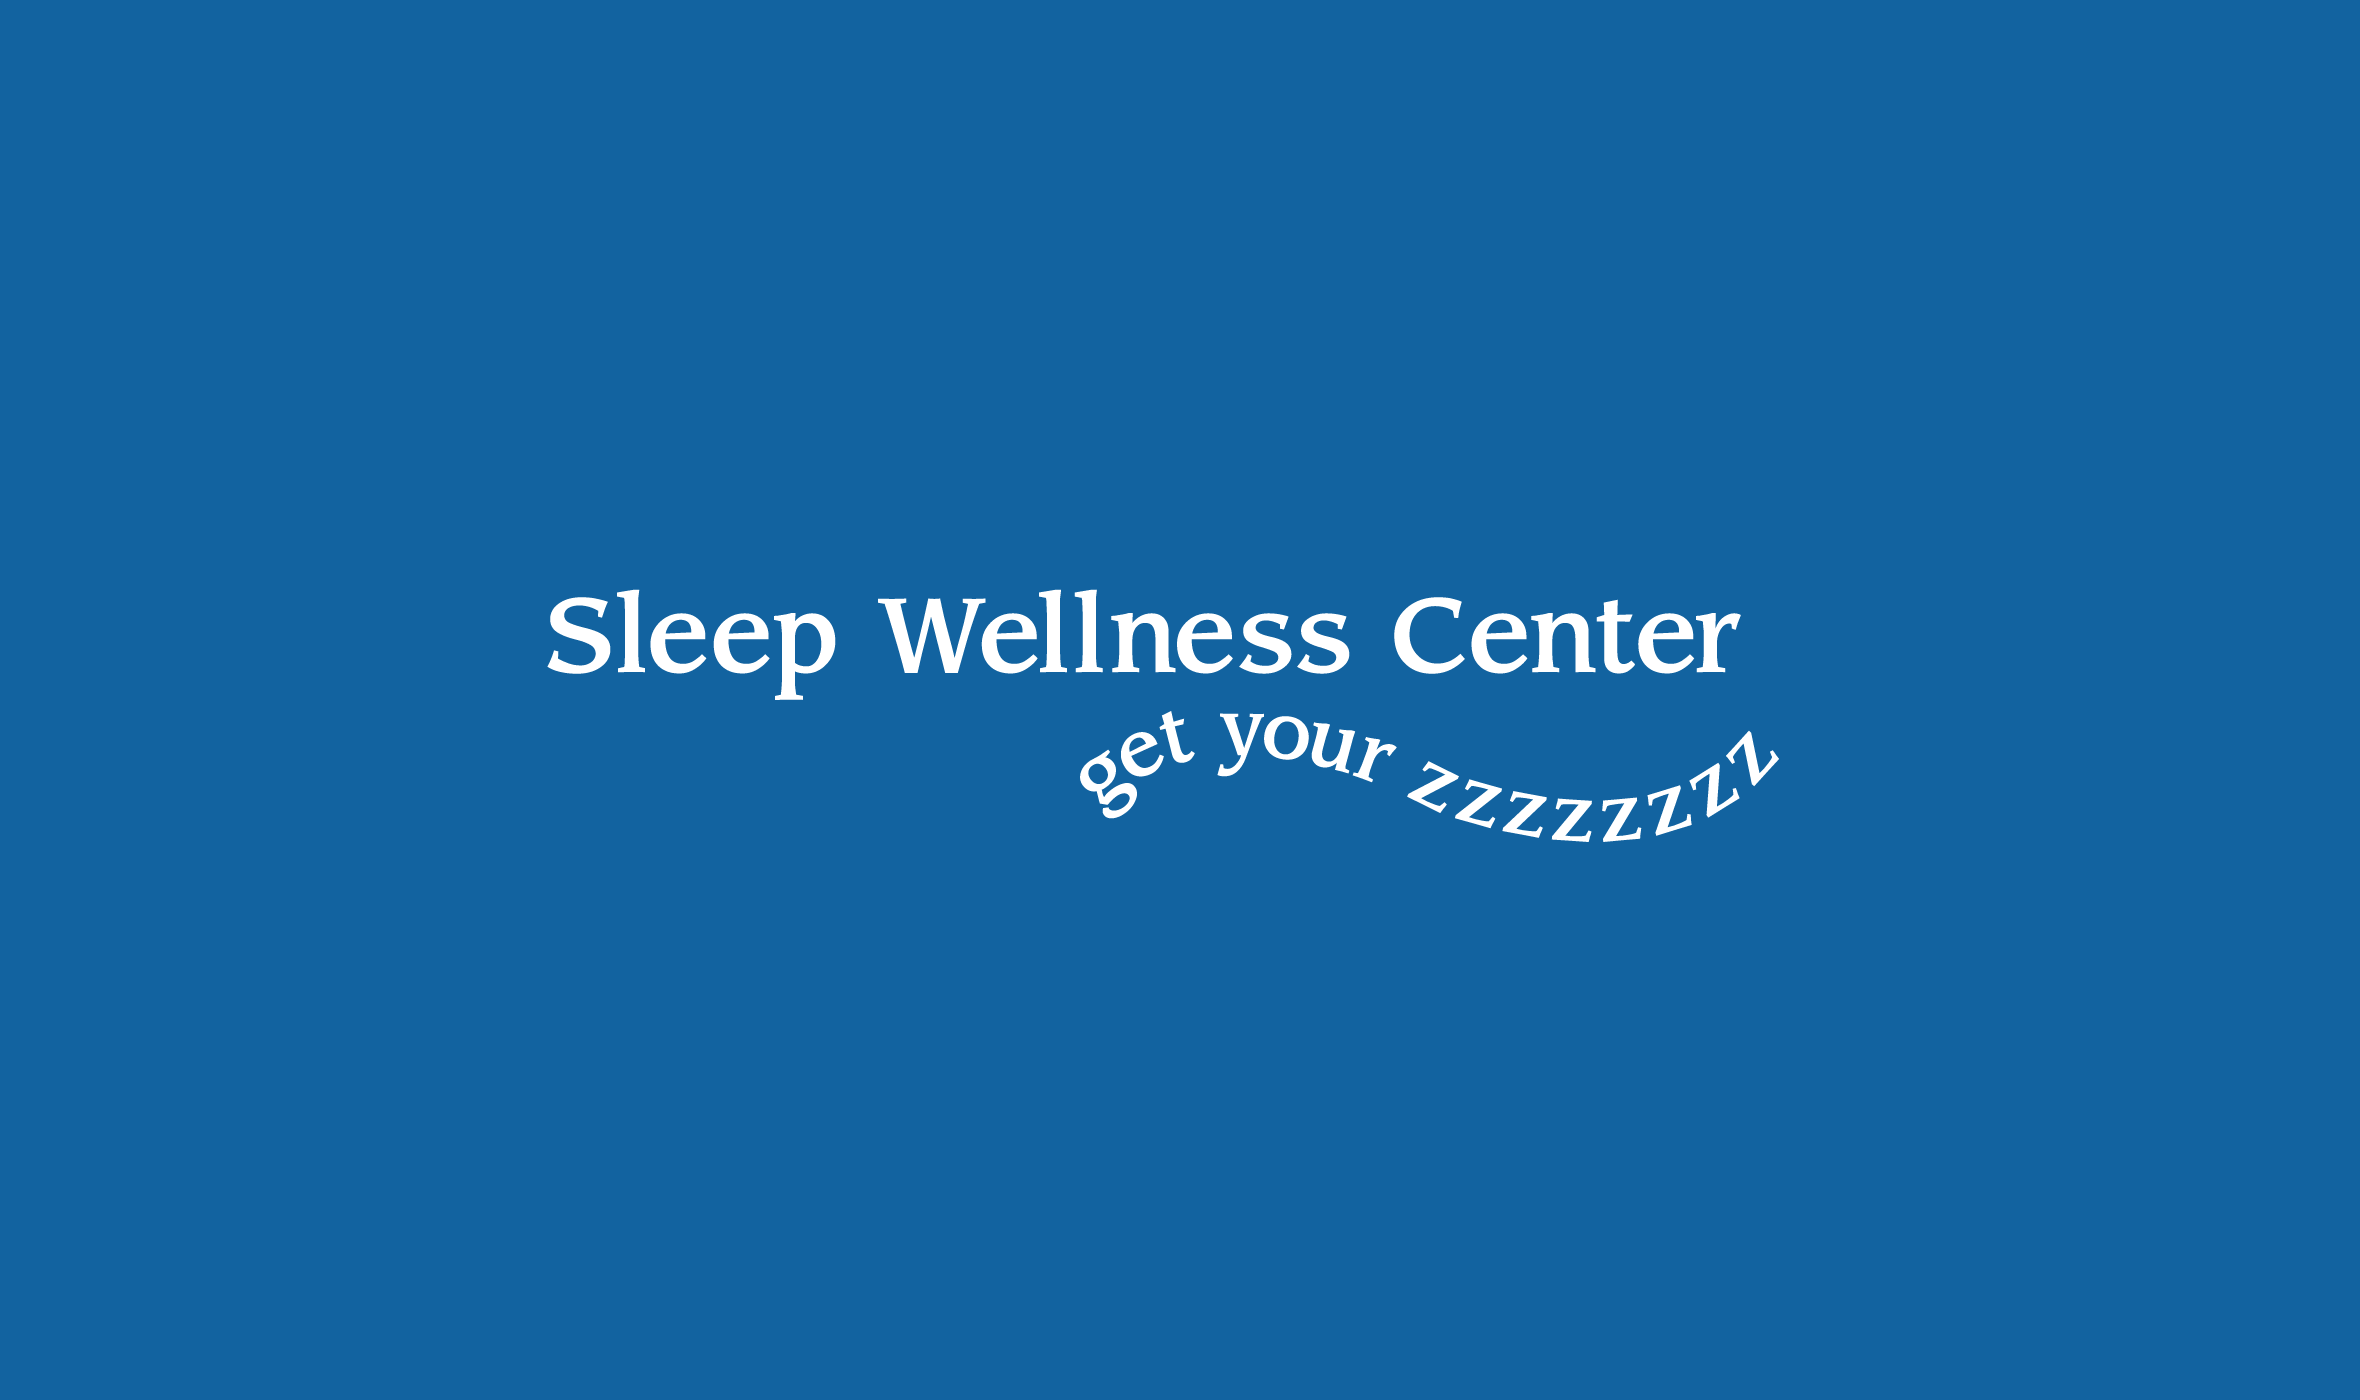 SleepWellnessCenter_Logo